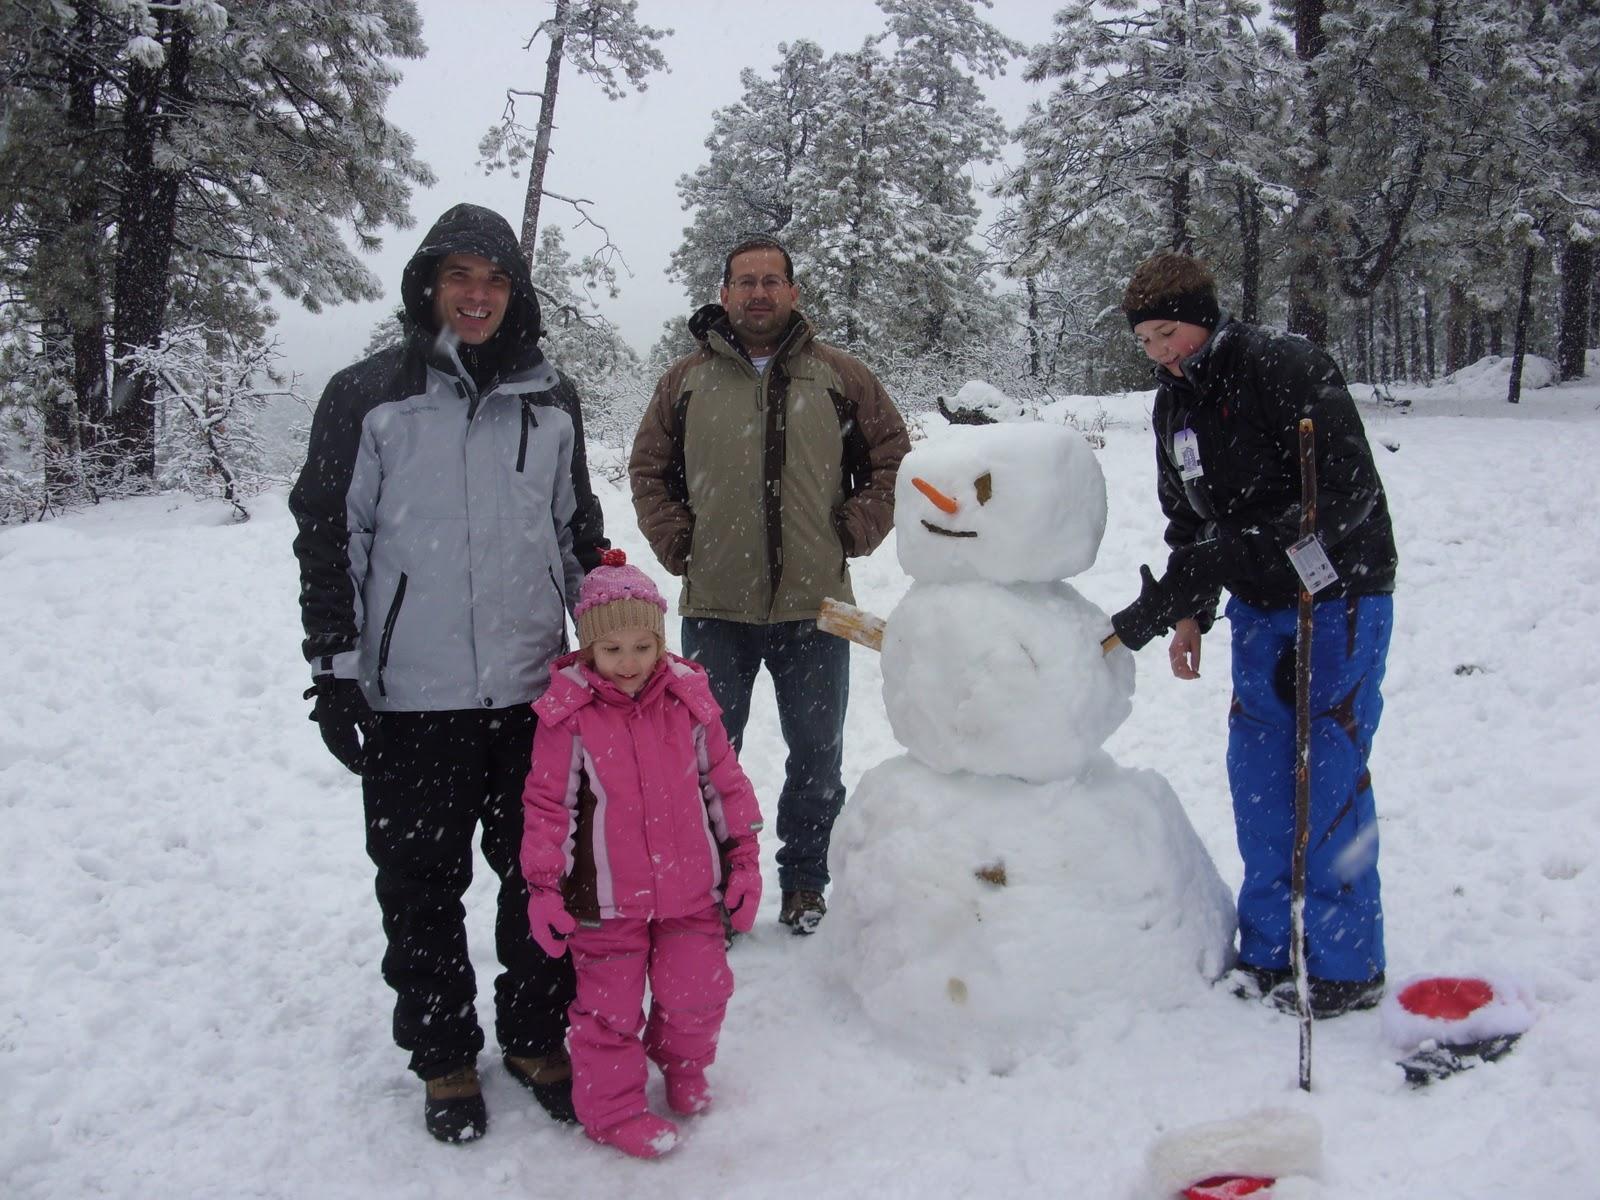 bella s blessings december 23 2010 fun in the snow